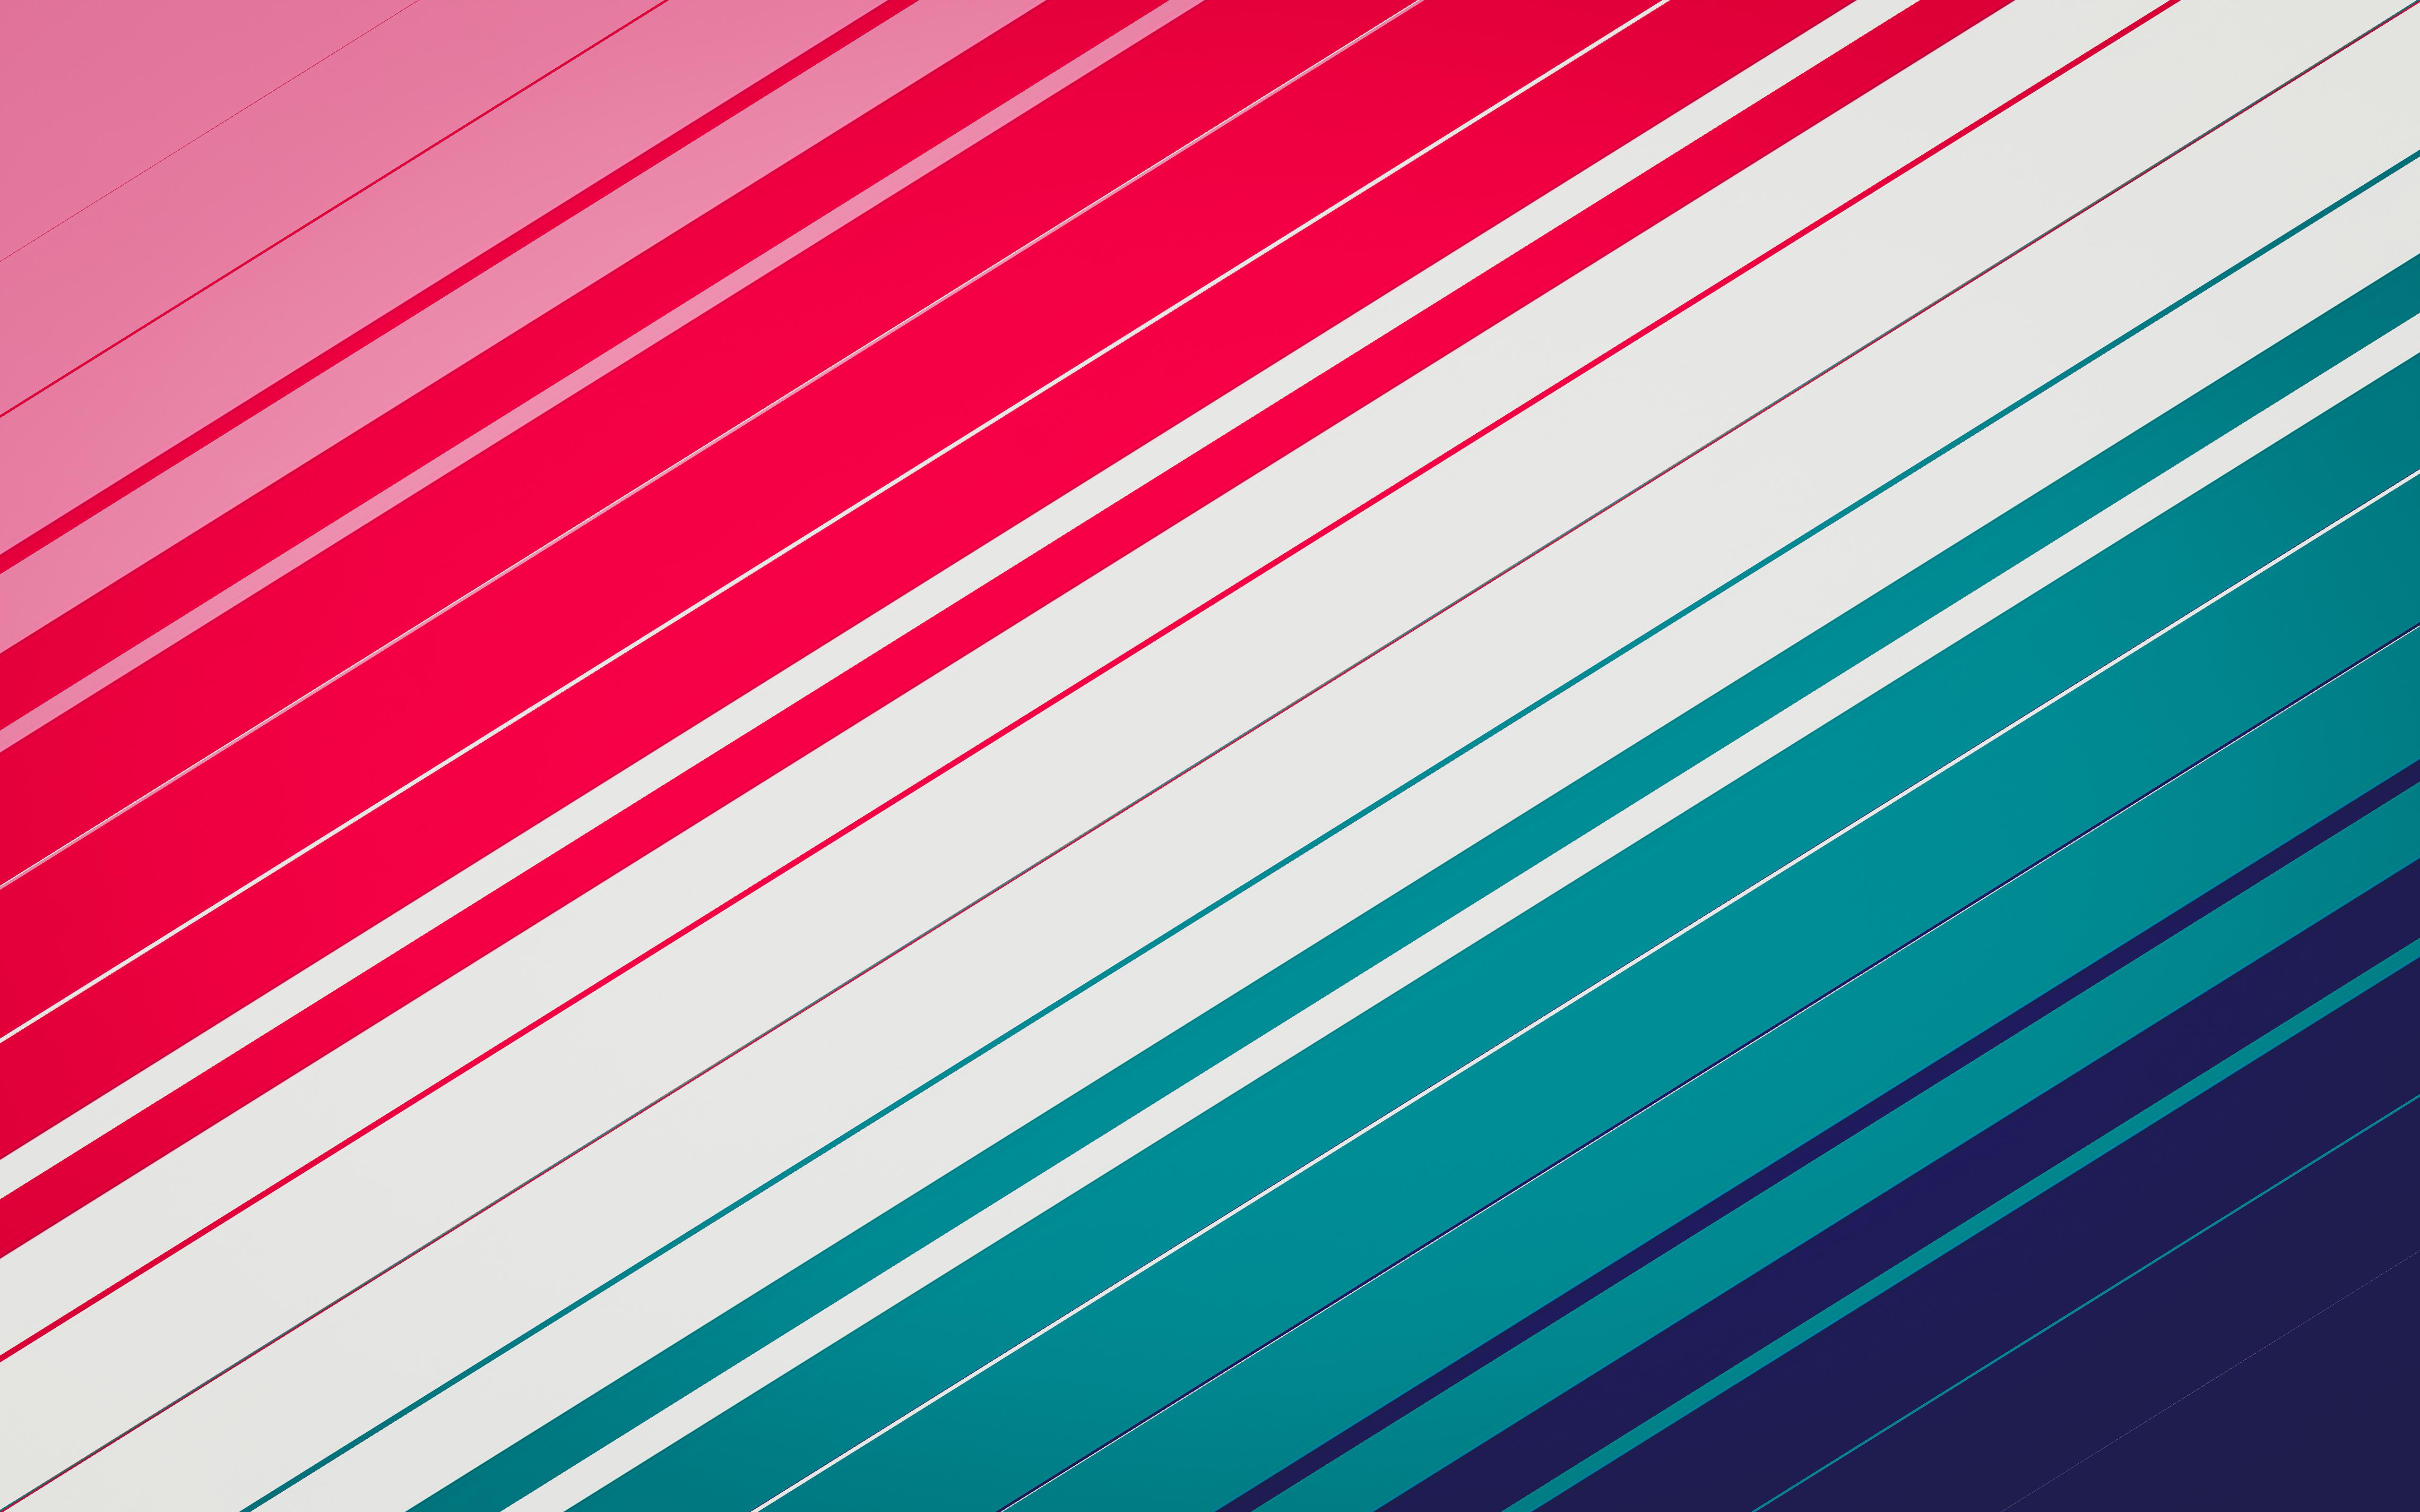 colorful lines abstract 4k 1620164317 - Colorful Lines Abstract 4k - Colorful Lines Abstract 4k wallpapers